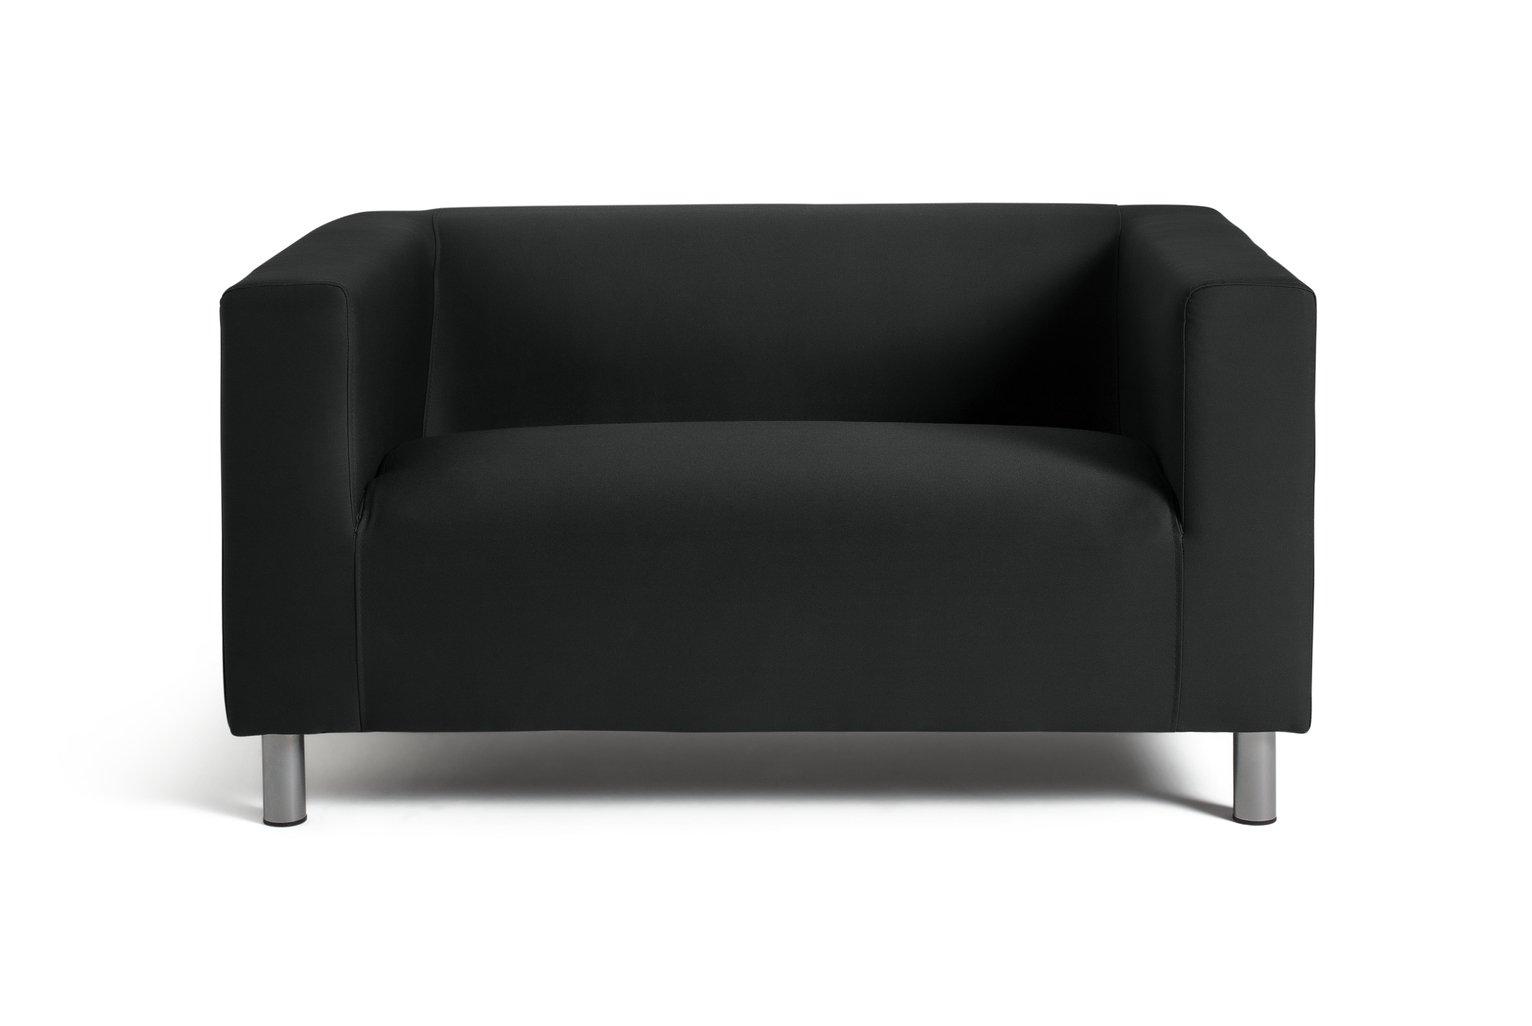 HOME Moda Compact 2 Seater Fabric Sofa   Black